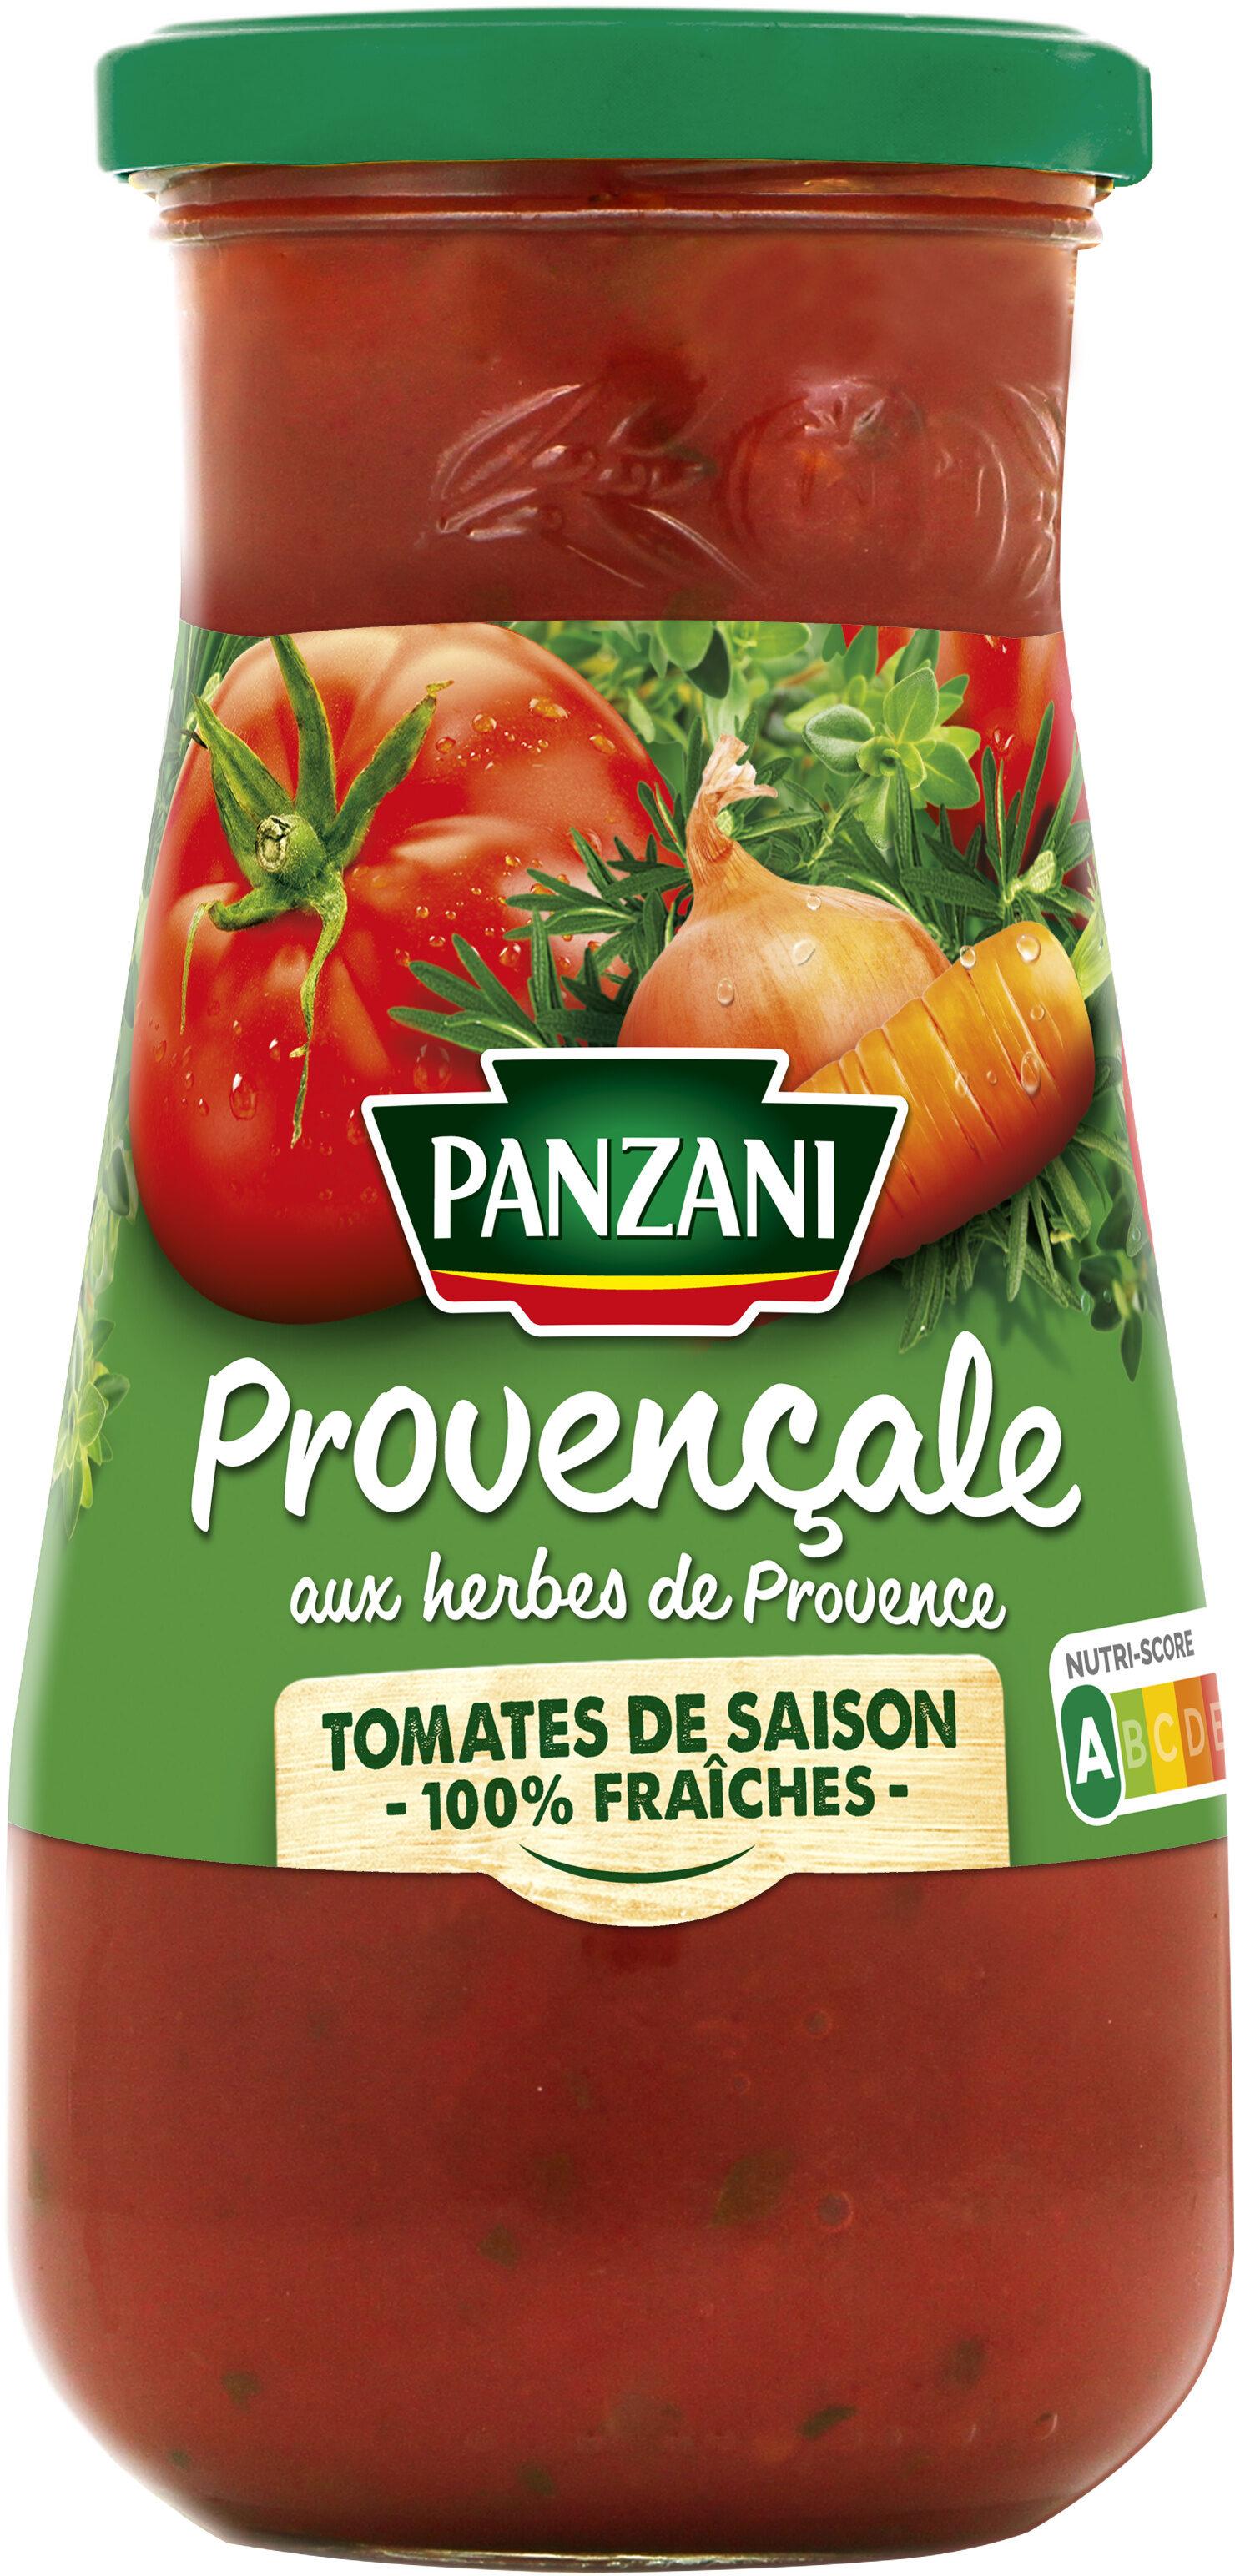 Panzani - spf - sauce provençale - Product - fr